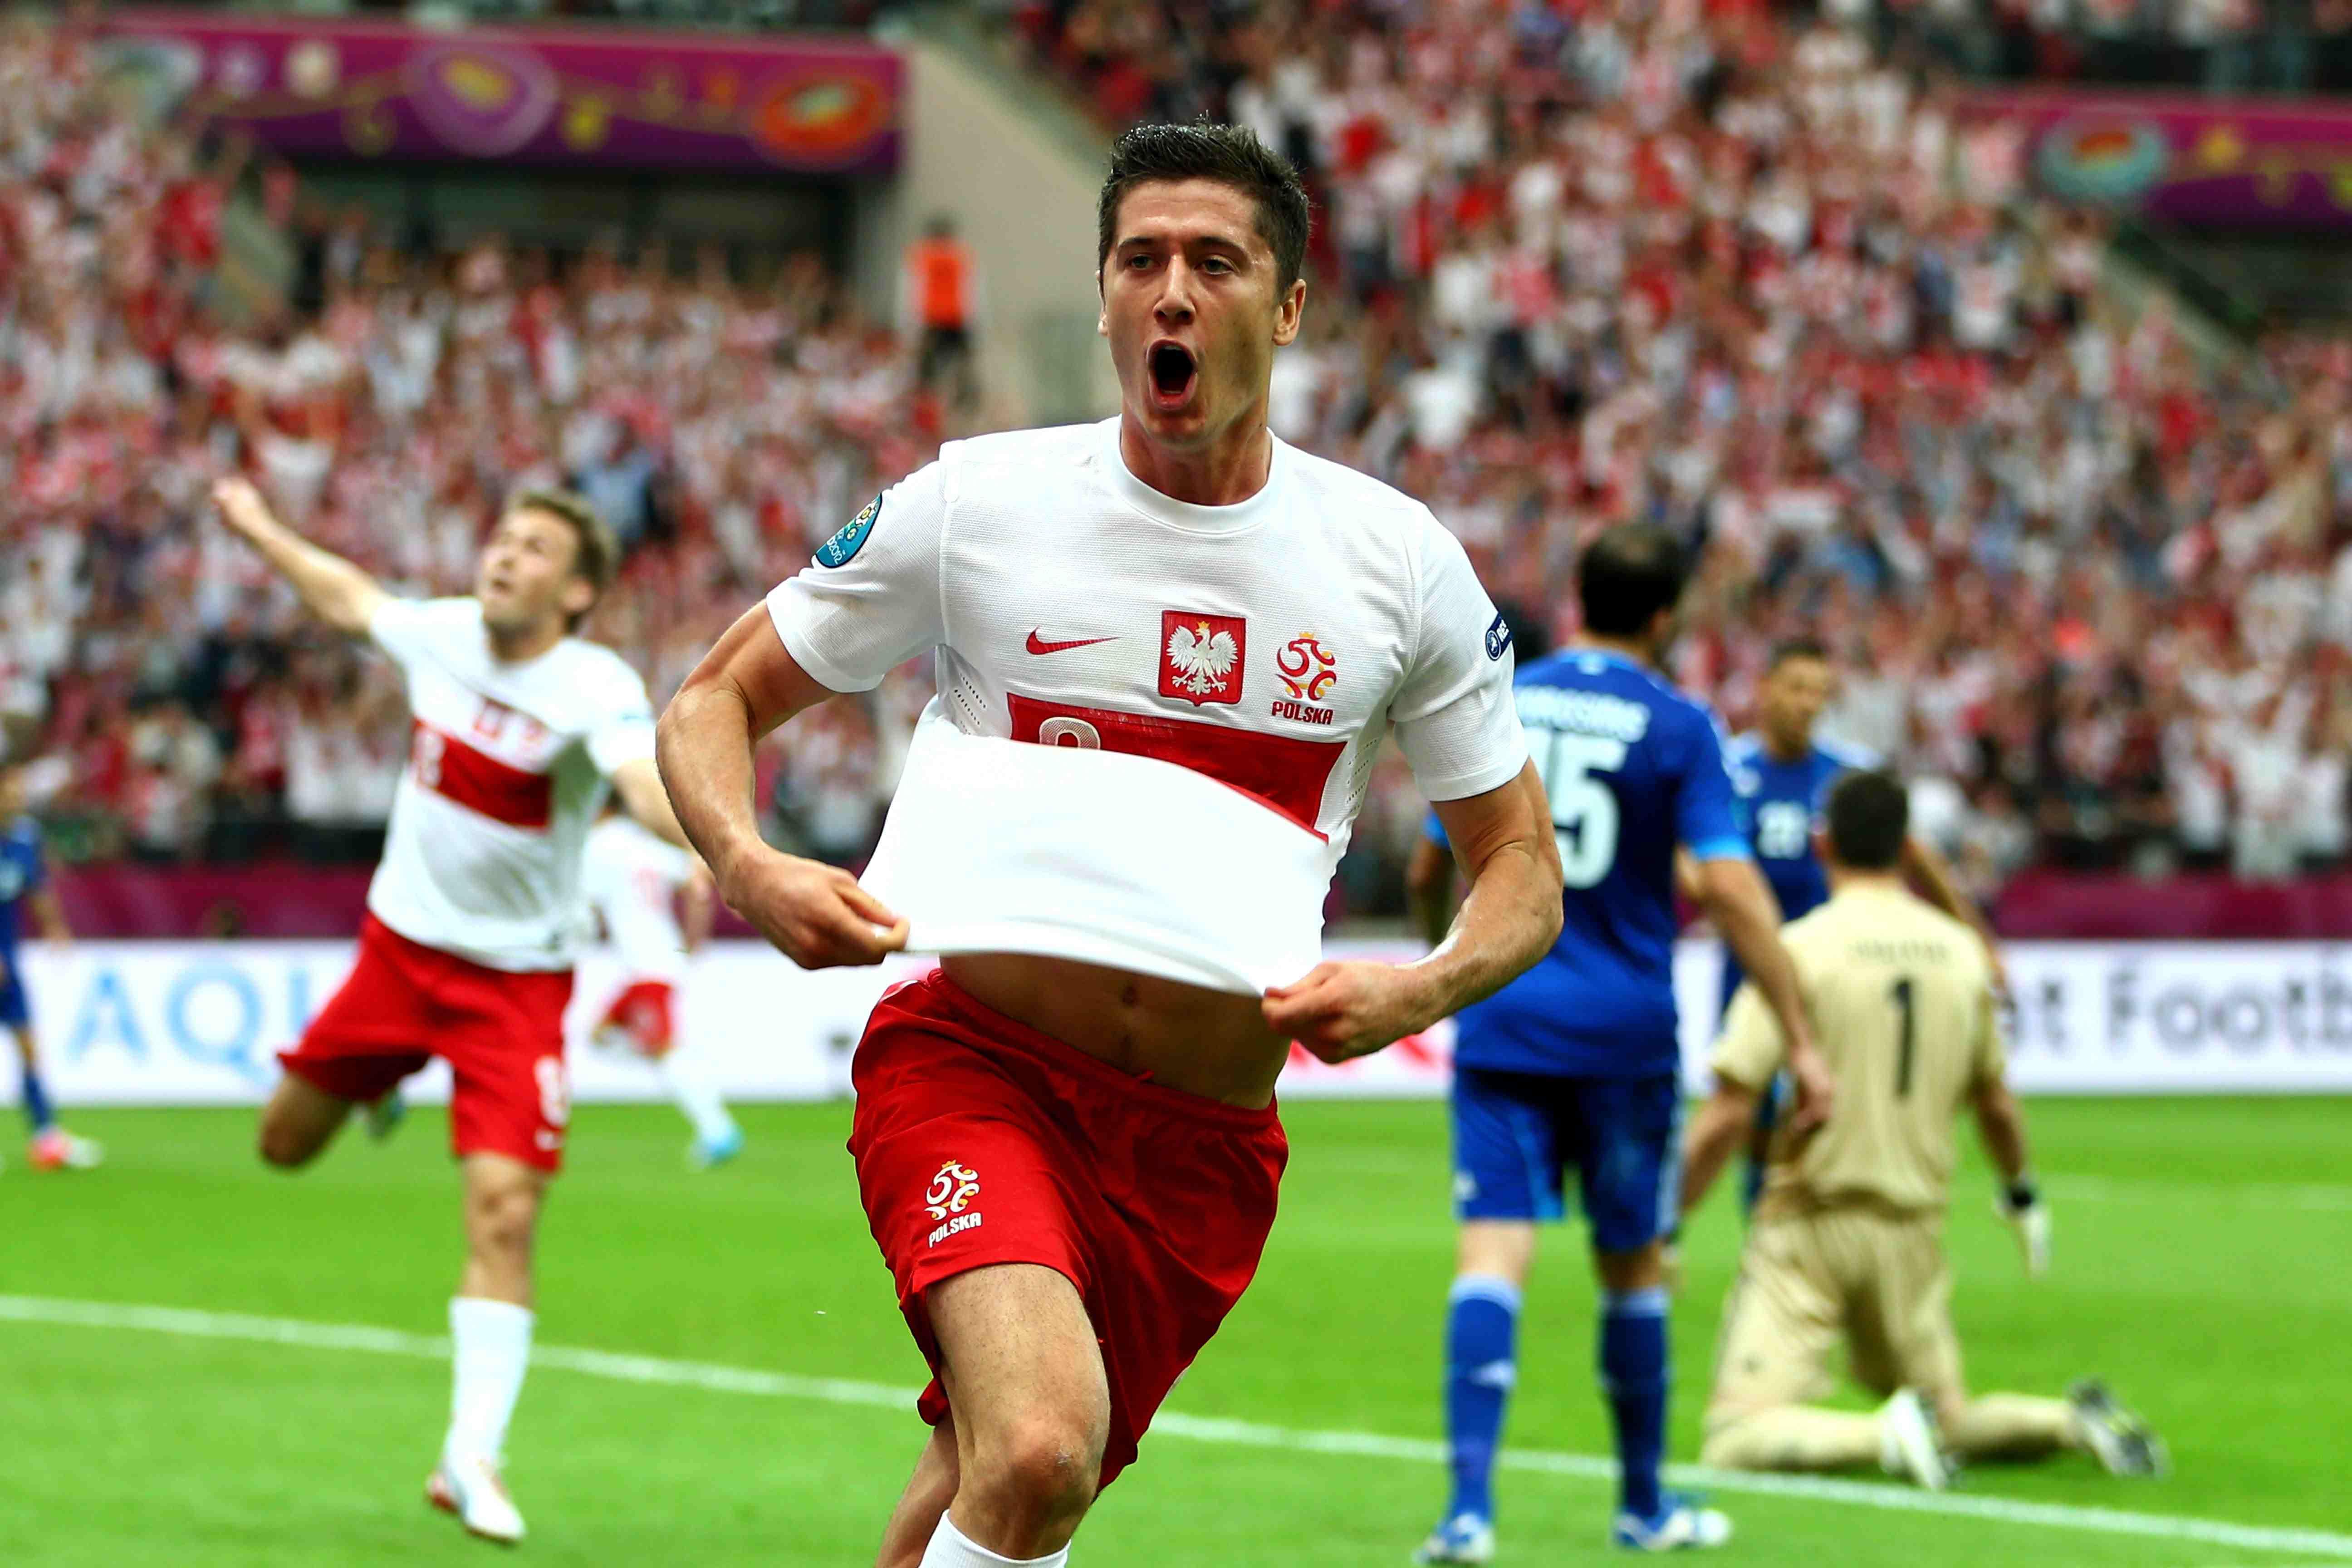 австрия футбол экспертов сербия прогноз